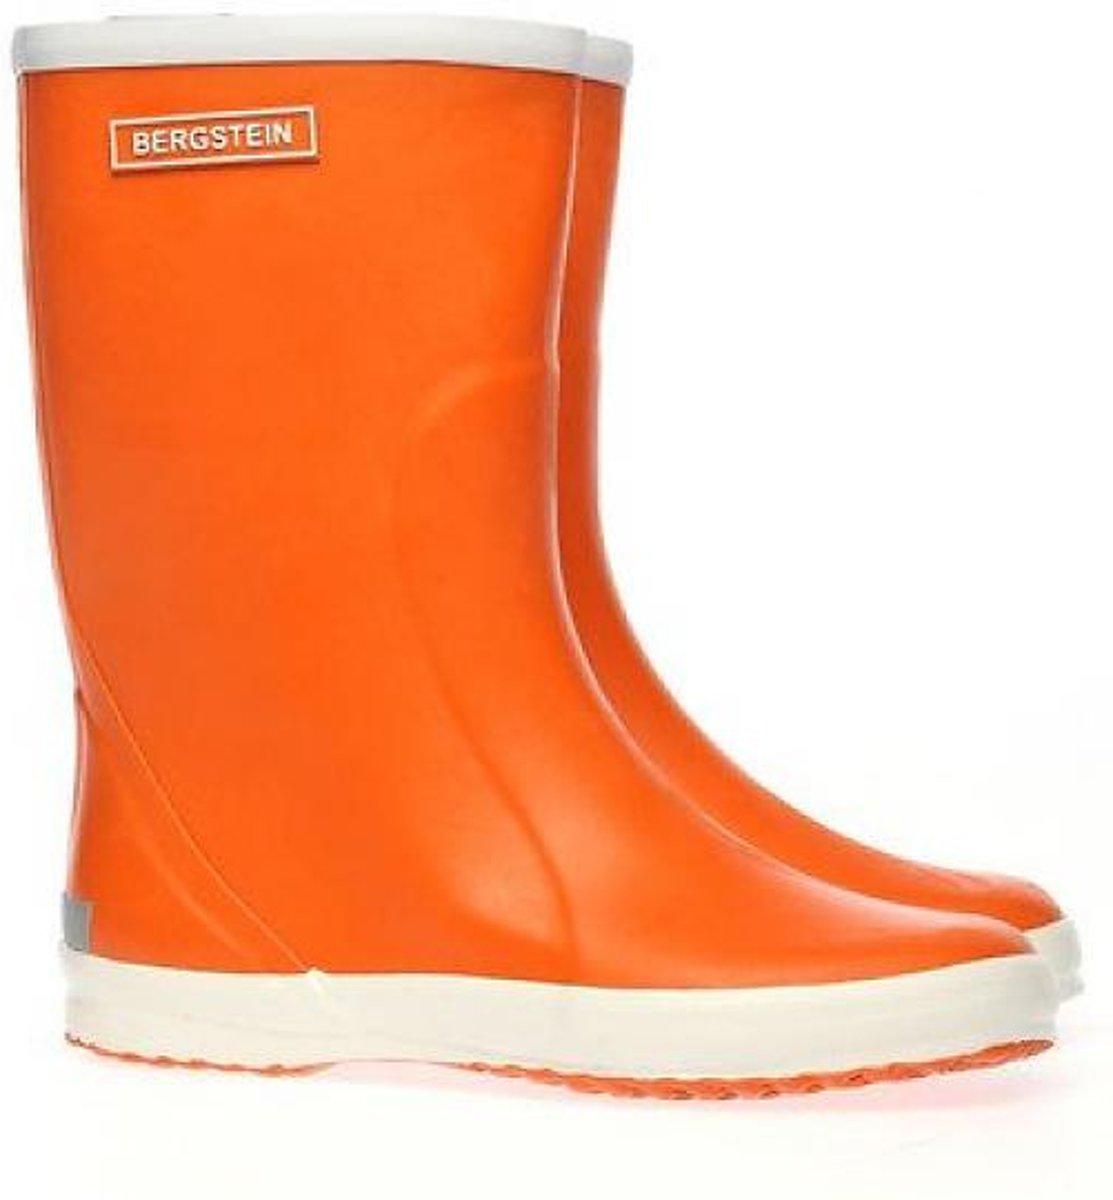 Bergstein Rainboots Nouveau D'orange yCHcYwL